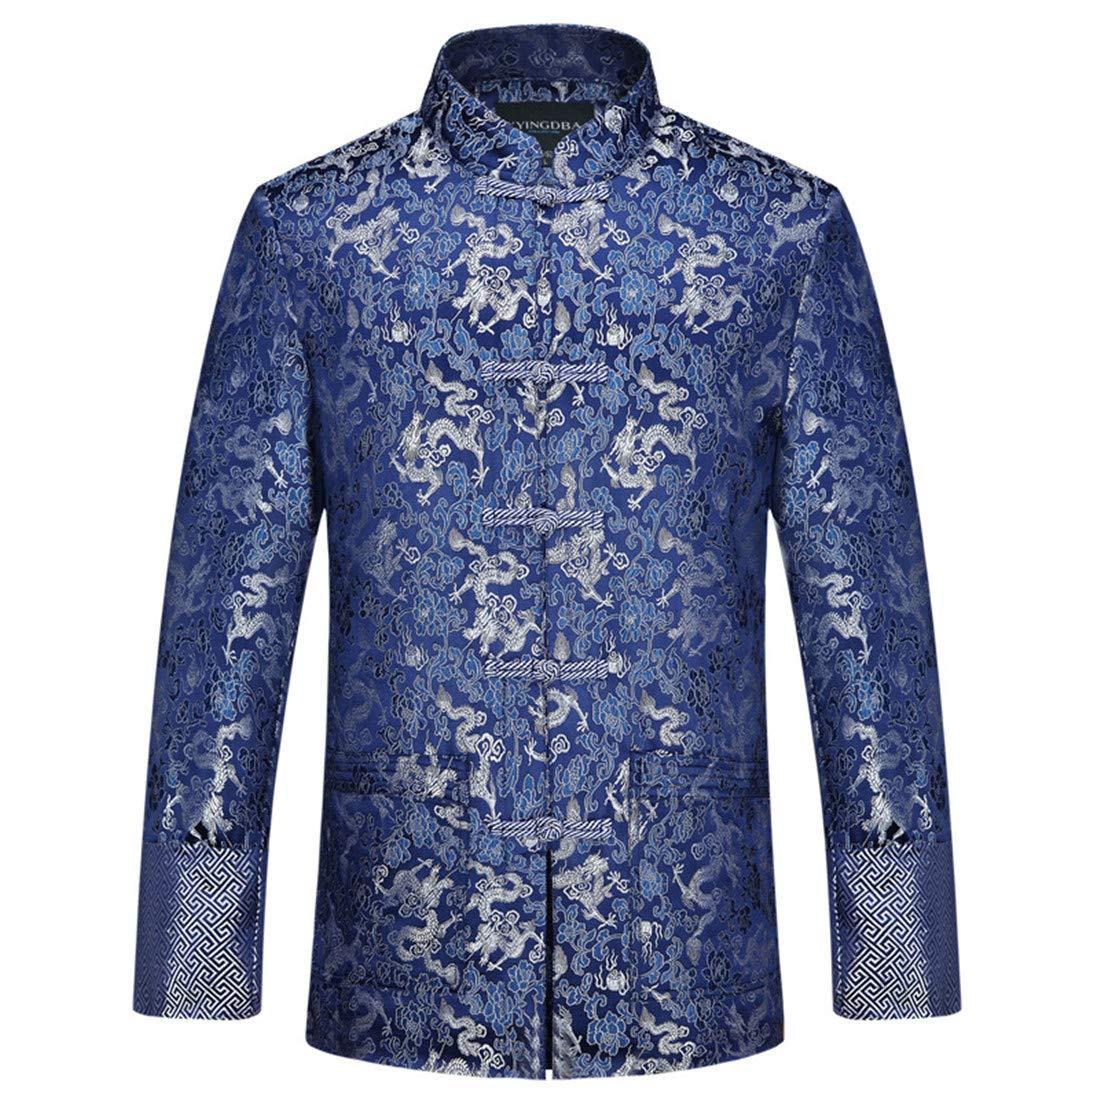 CAI&HONG-Domestics GCC Herren Tunika, Tang Anzug, Mantel